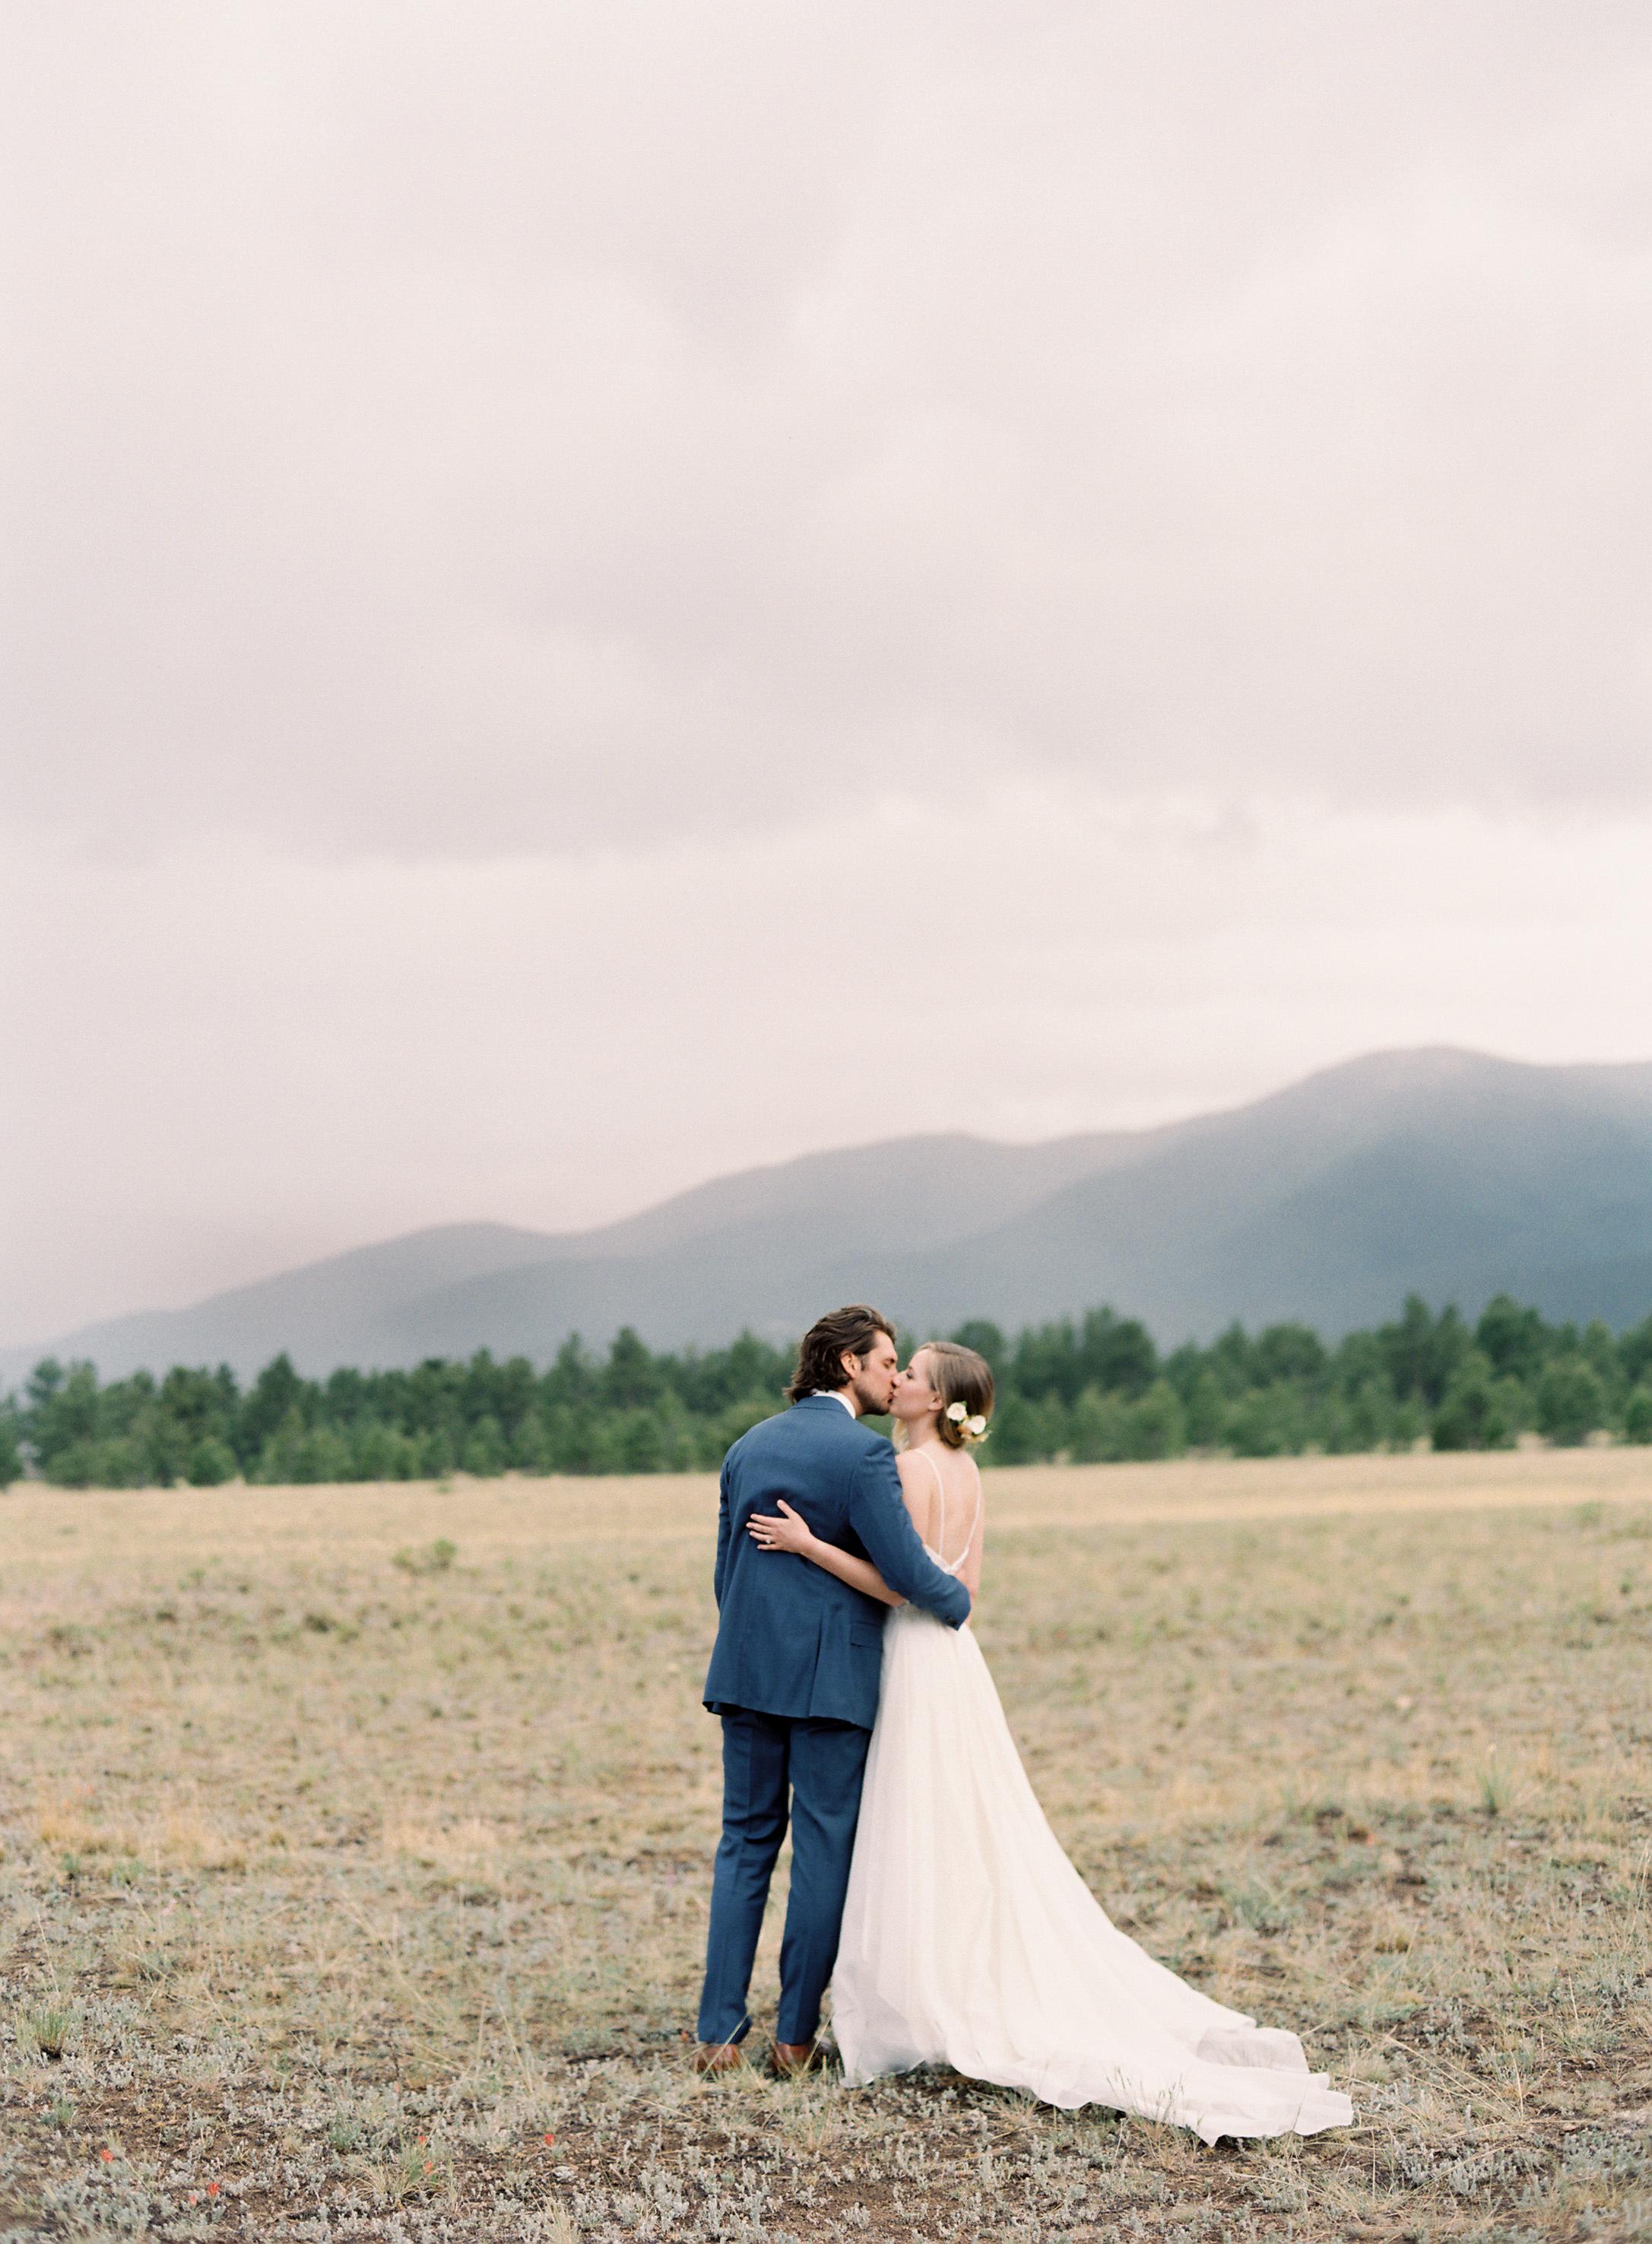 Jessica and Thomas-Wedding-Carrie King Photographer-13.jpg